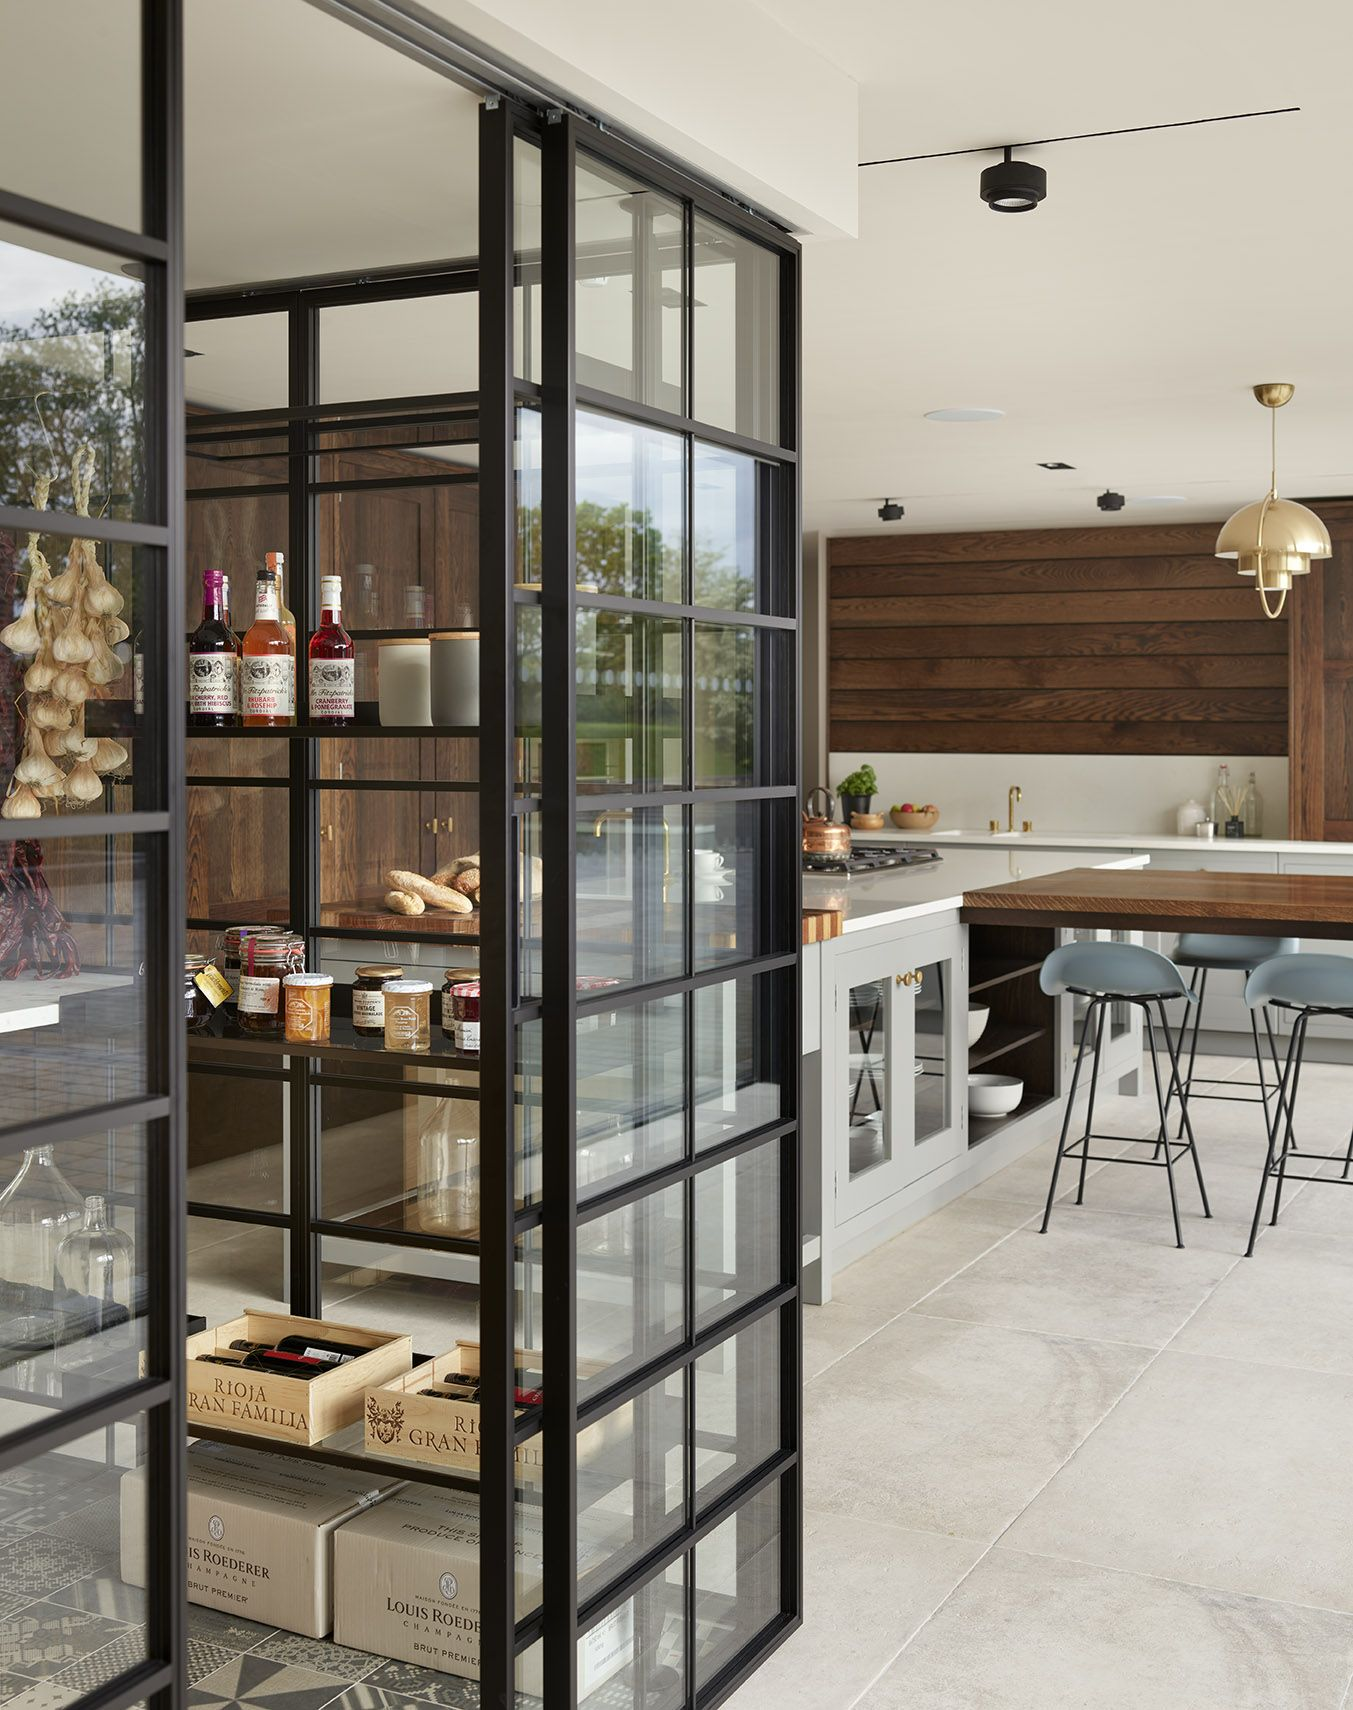 Kitchen architecture bulthaup showroom cheshire in kitchens